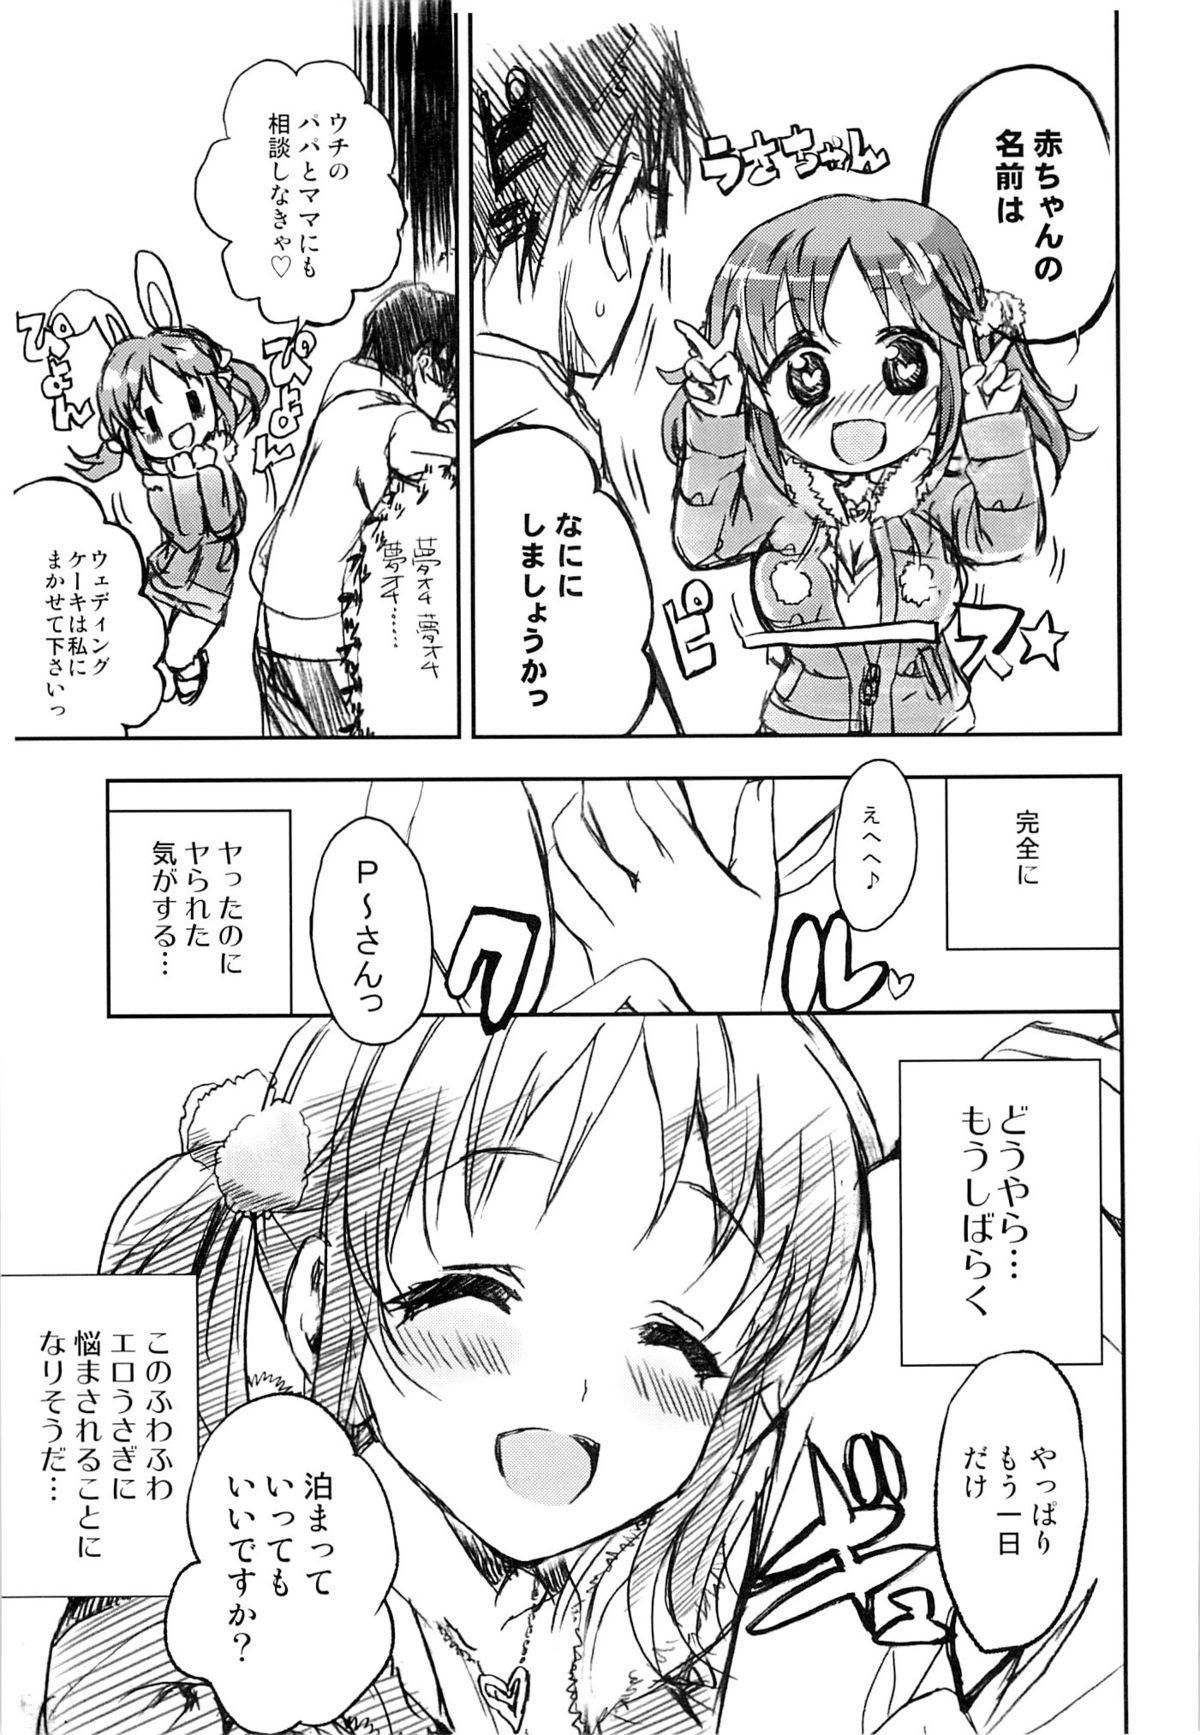 Passion Fruit Girls #Totoki Airi Princess Bunny wa Nemuranai 27